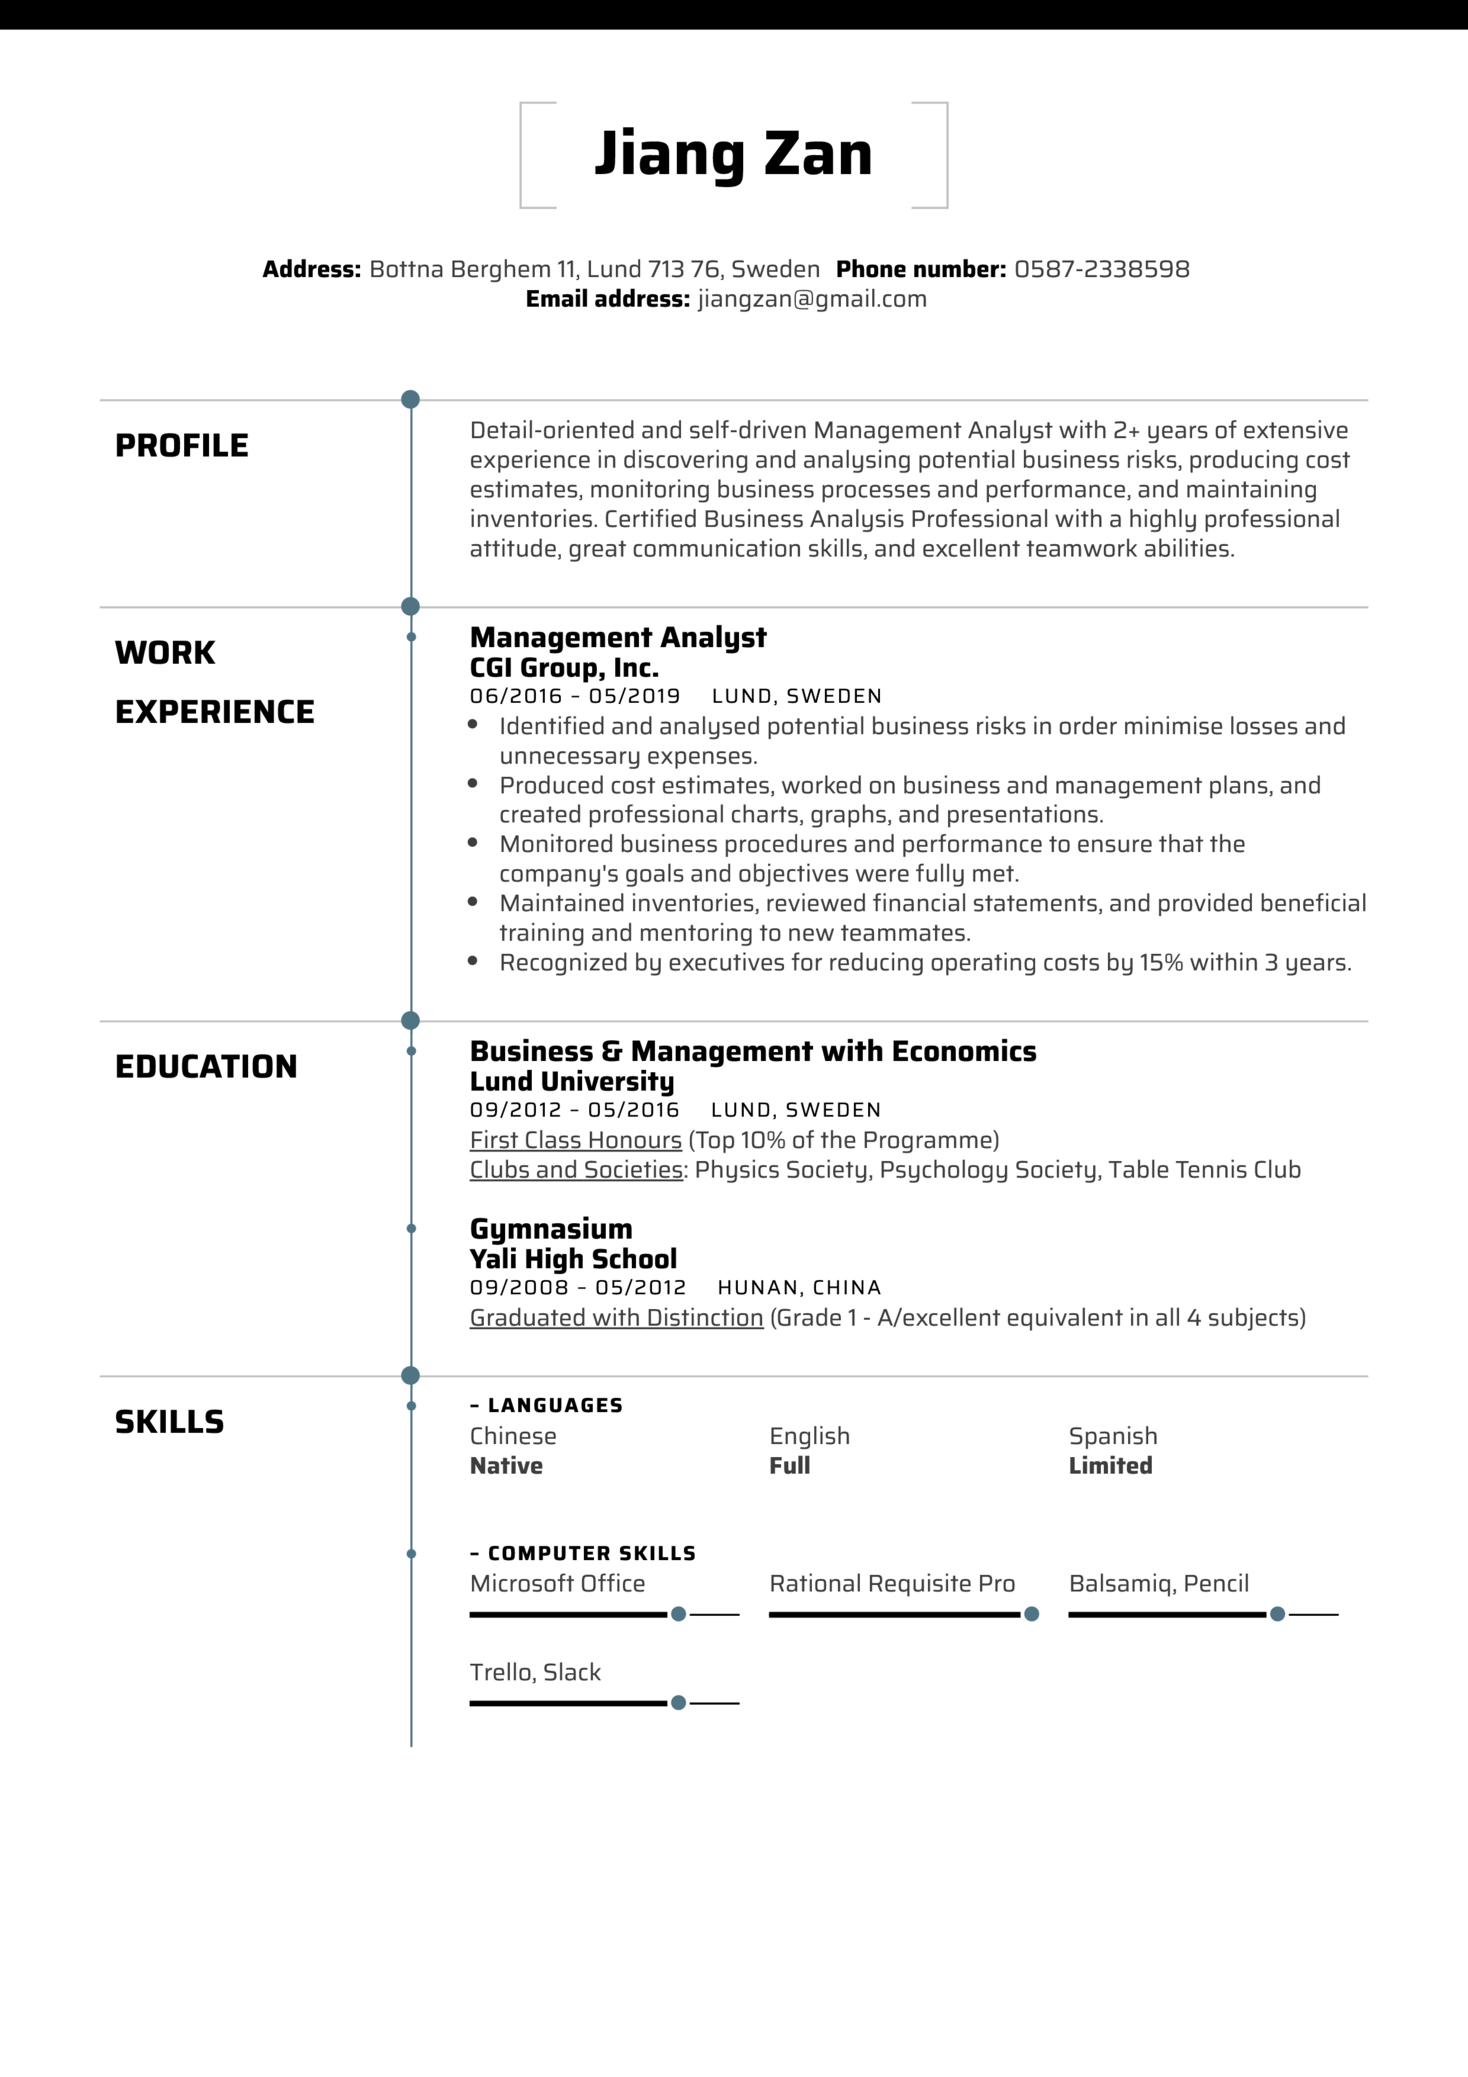 Management Analyst Resume Sample (Part 1)